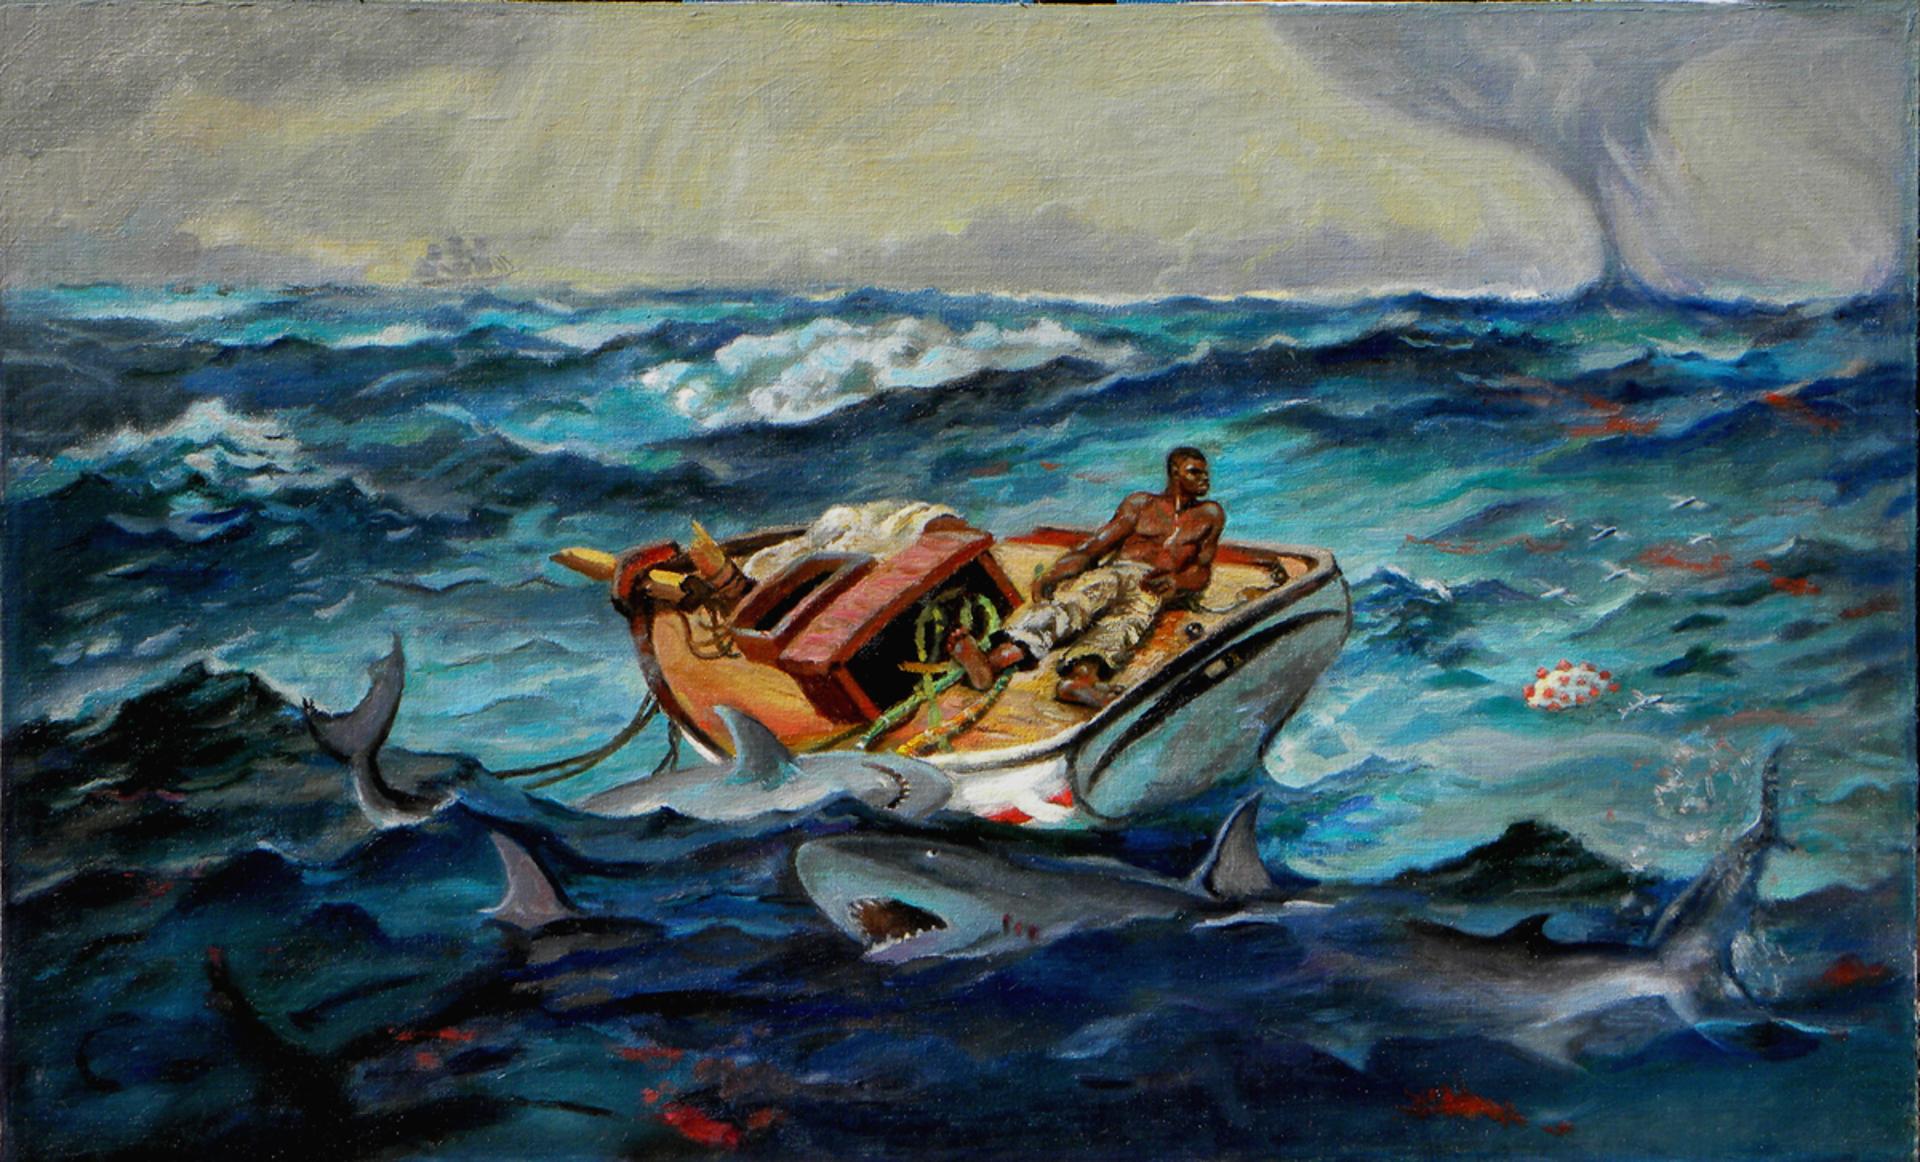 Gulf Stream Pandemic by Tom Sadler